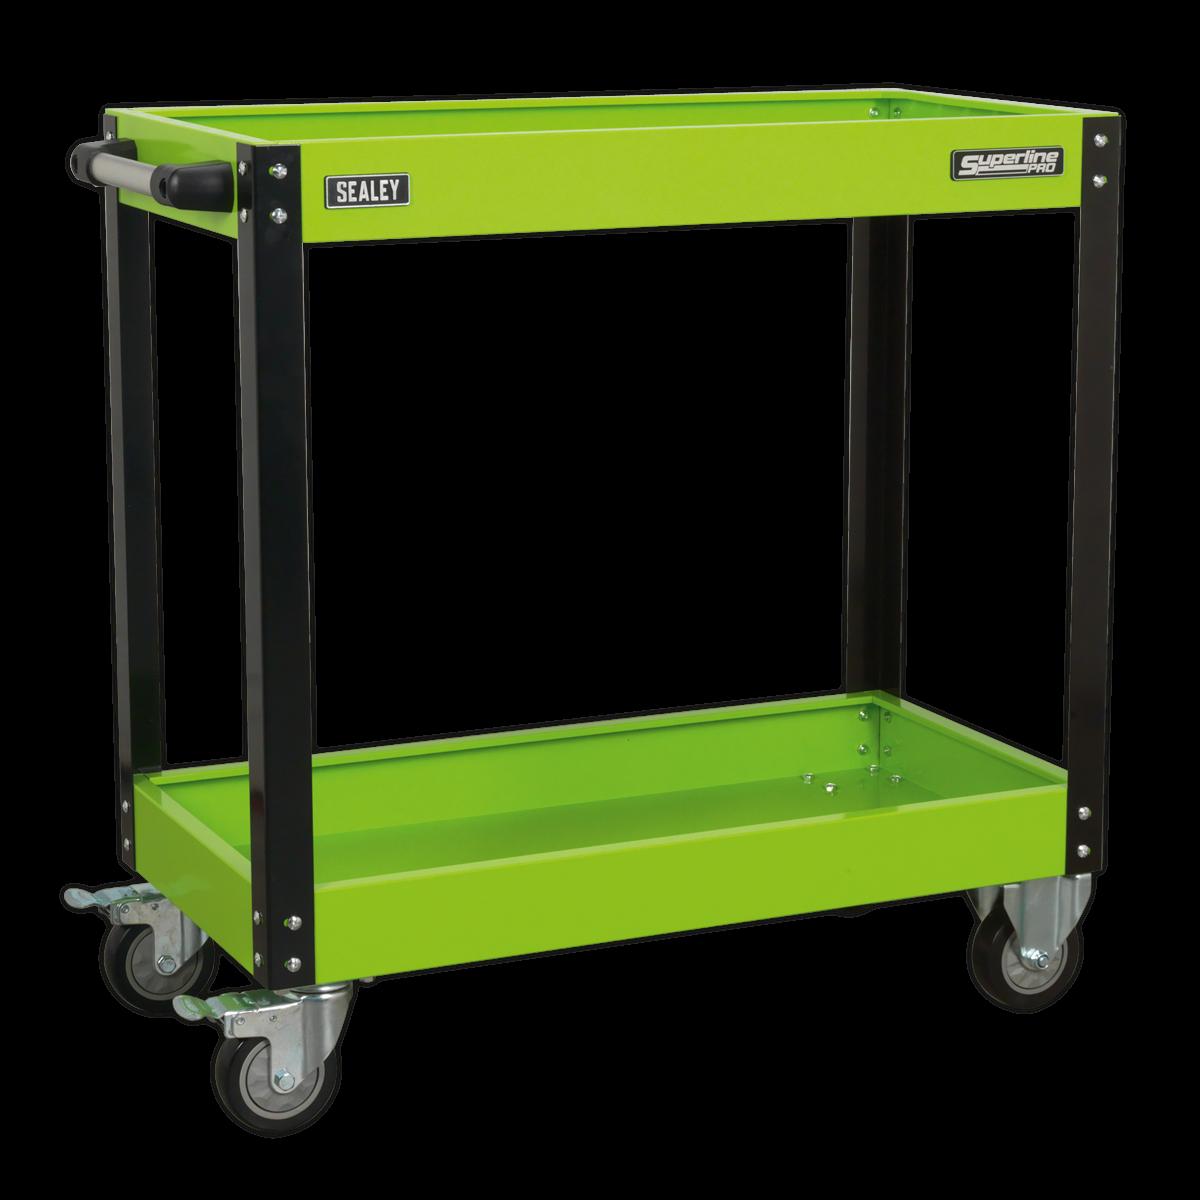 SEALEY Workshop Trolley 2 Level Heavy Duty Hi-Vis Green